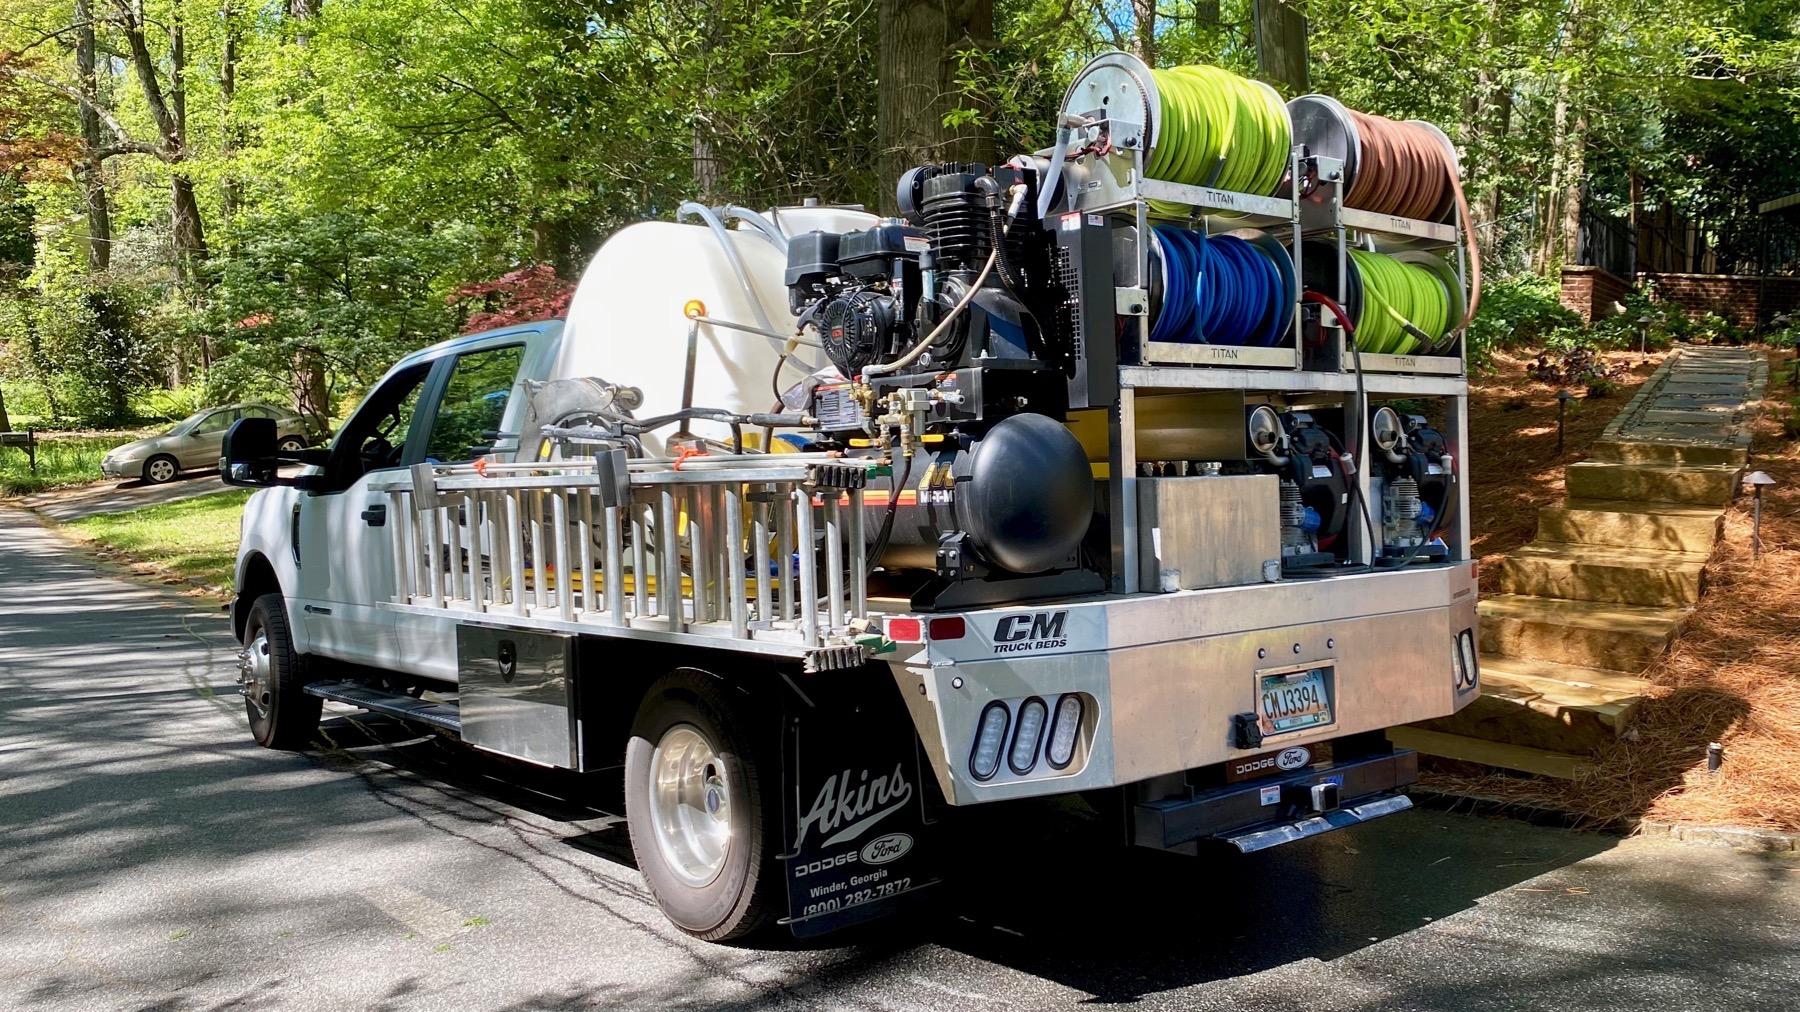 Chlorine truck